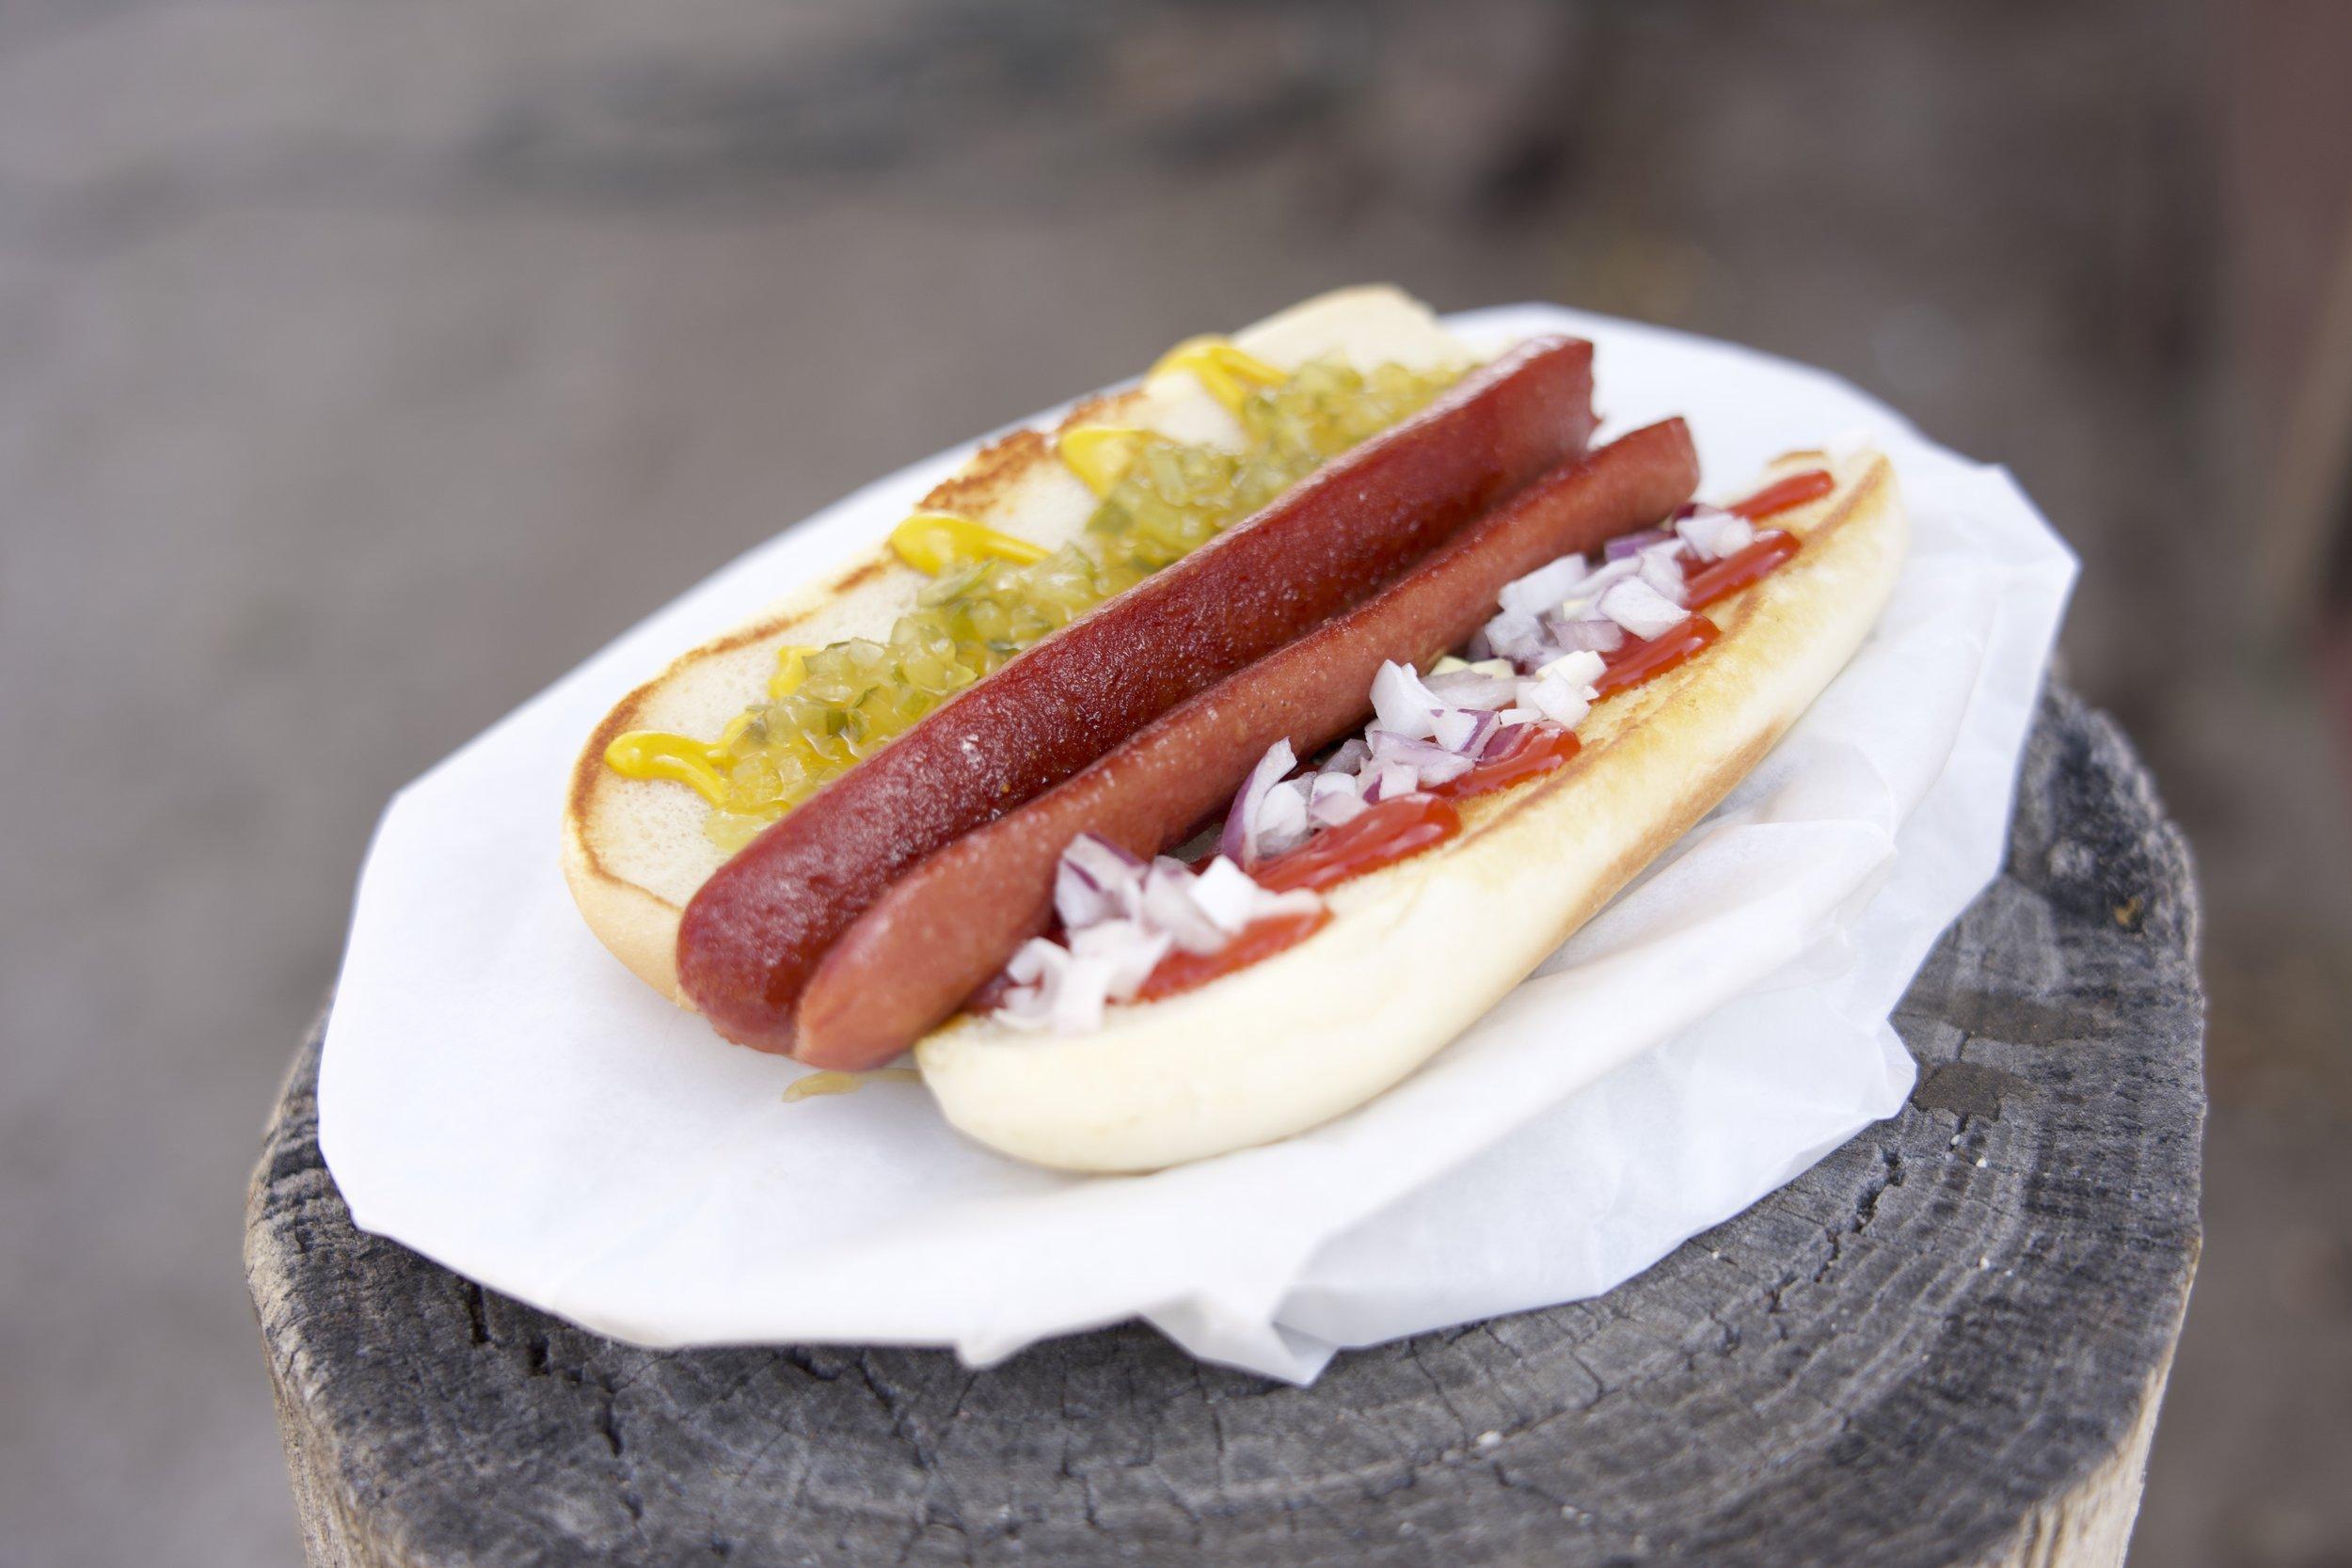 Hot Dogs - Hot Dog…….$4.00